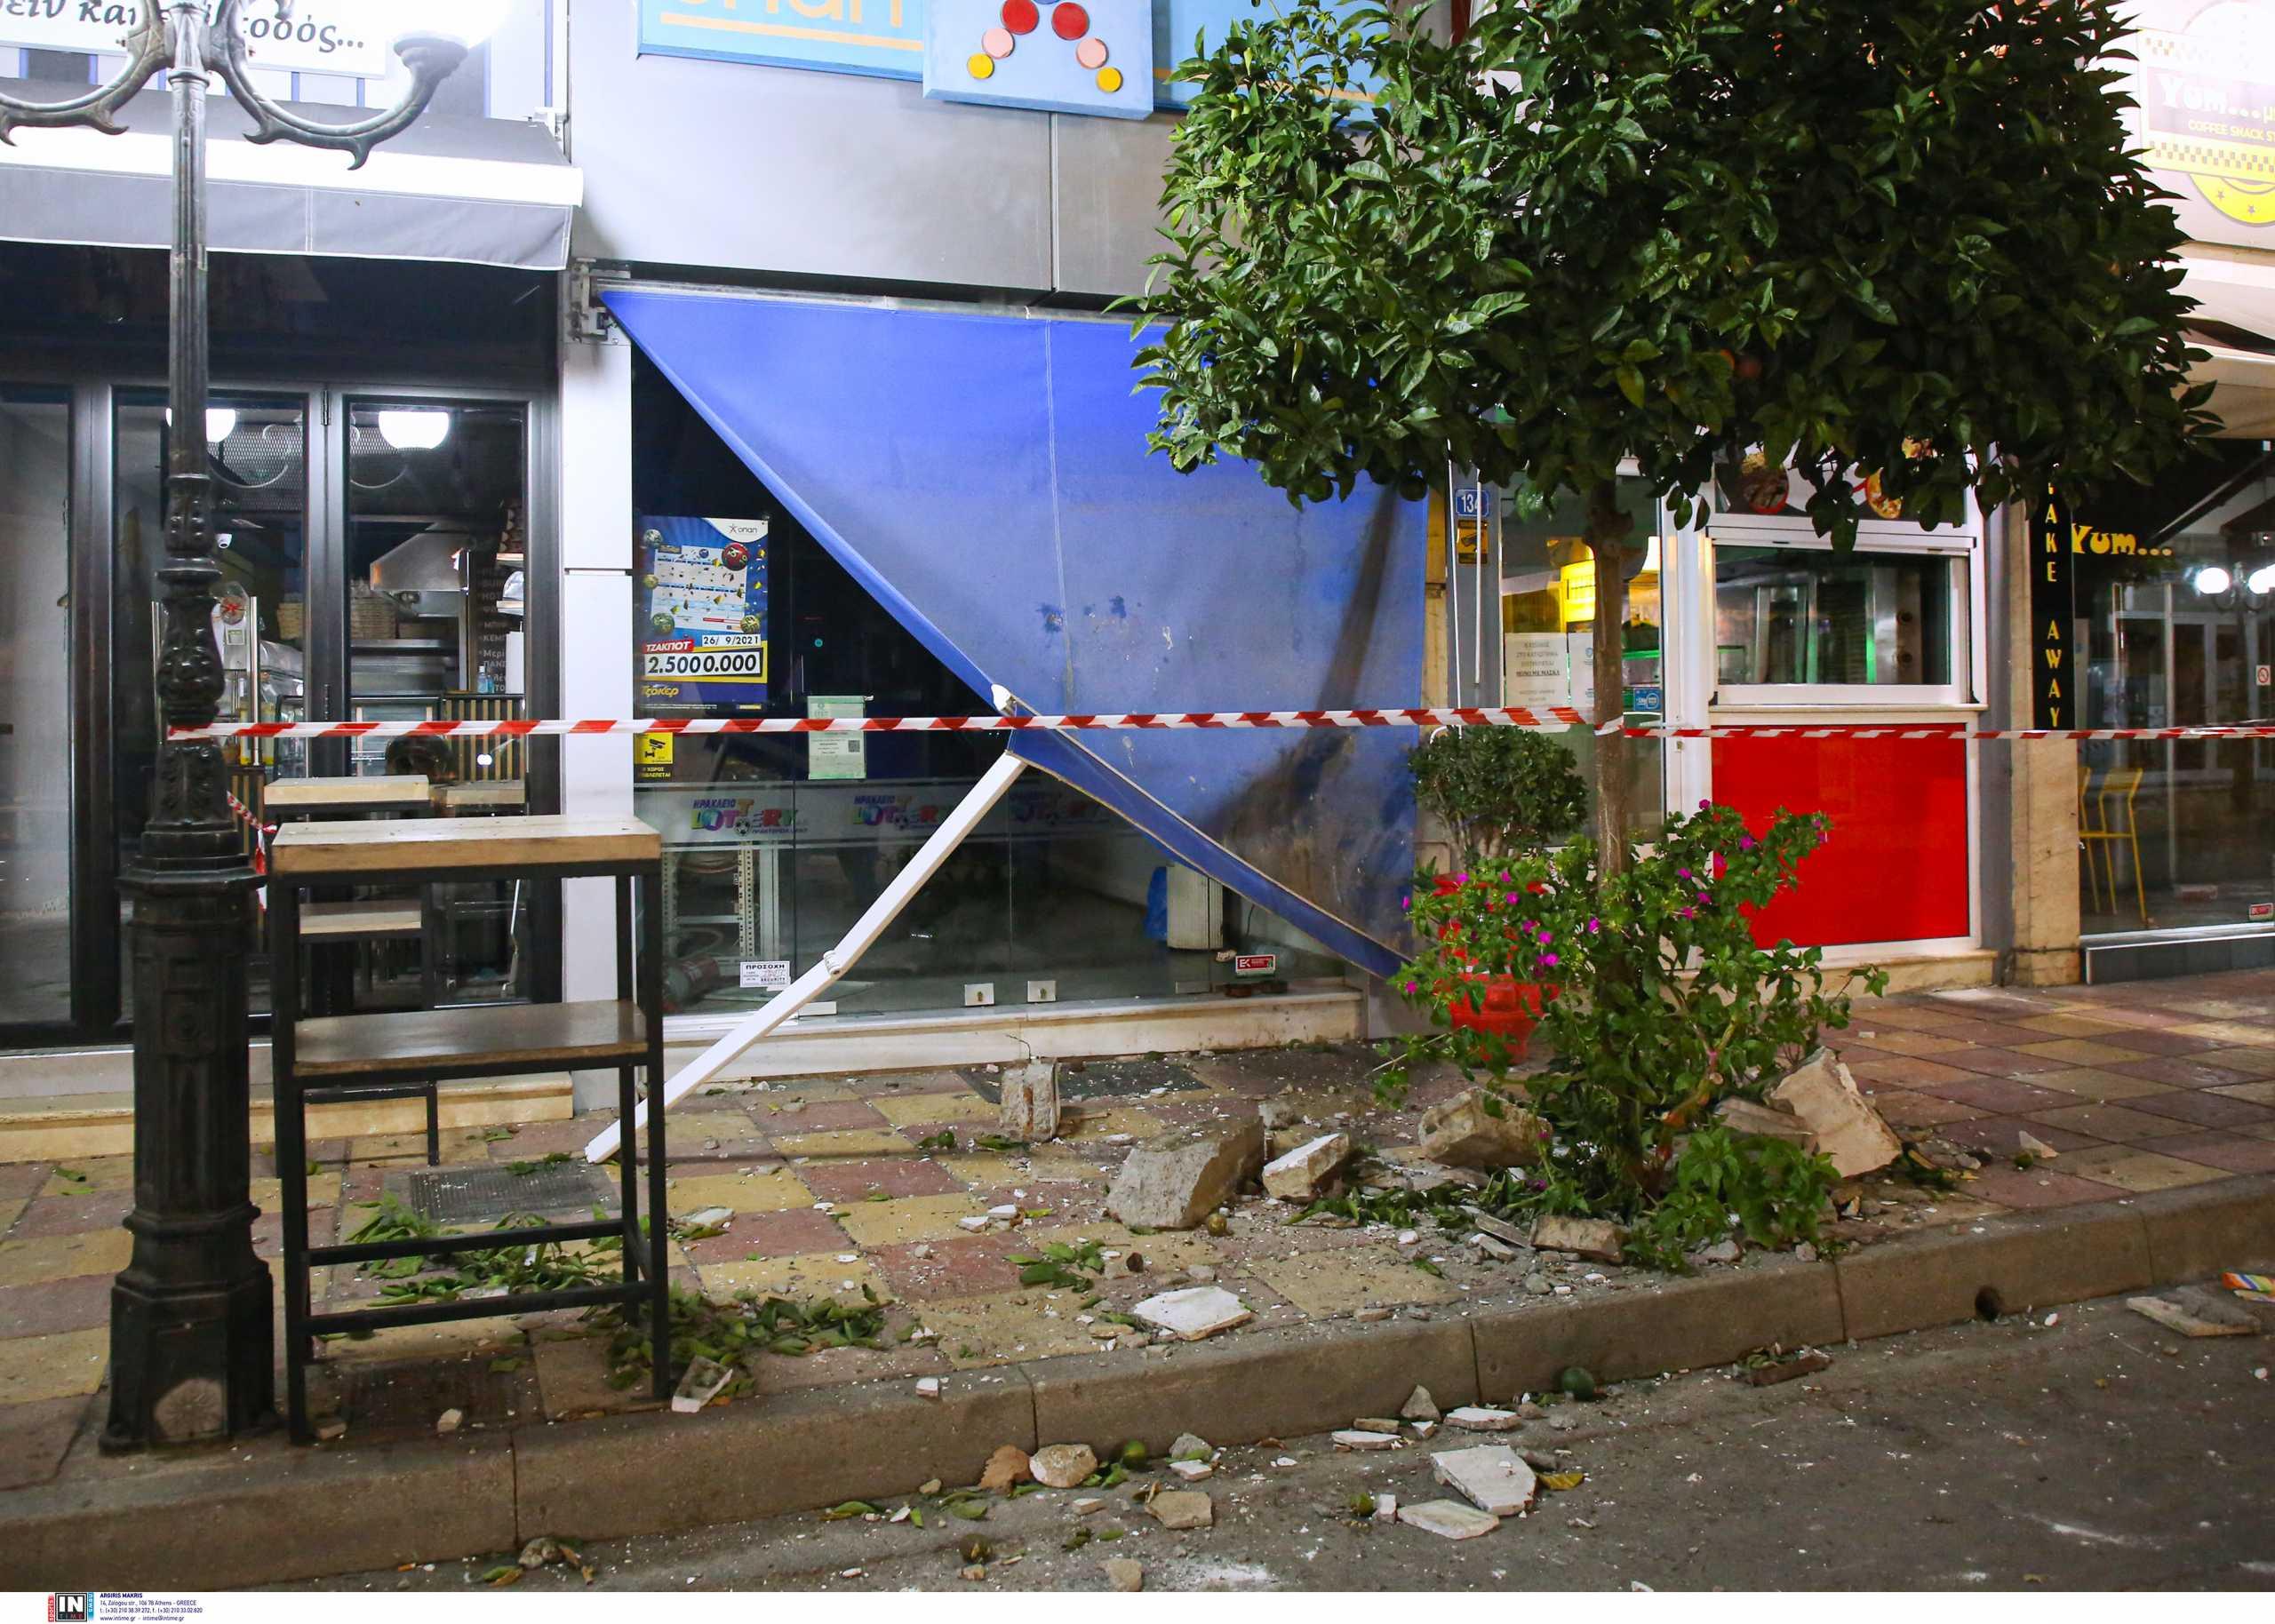 e-ΕΦΚΑ: Στηρίζει τους σεισμόπληκτους στο Αρκαλοχώρι